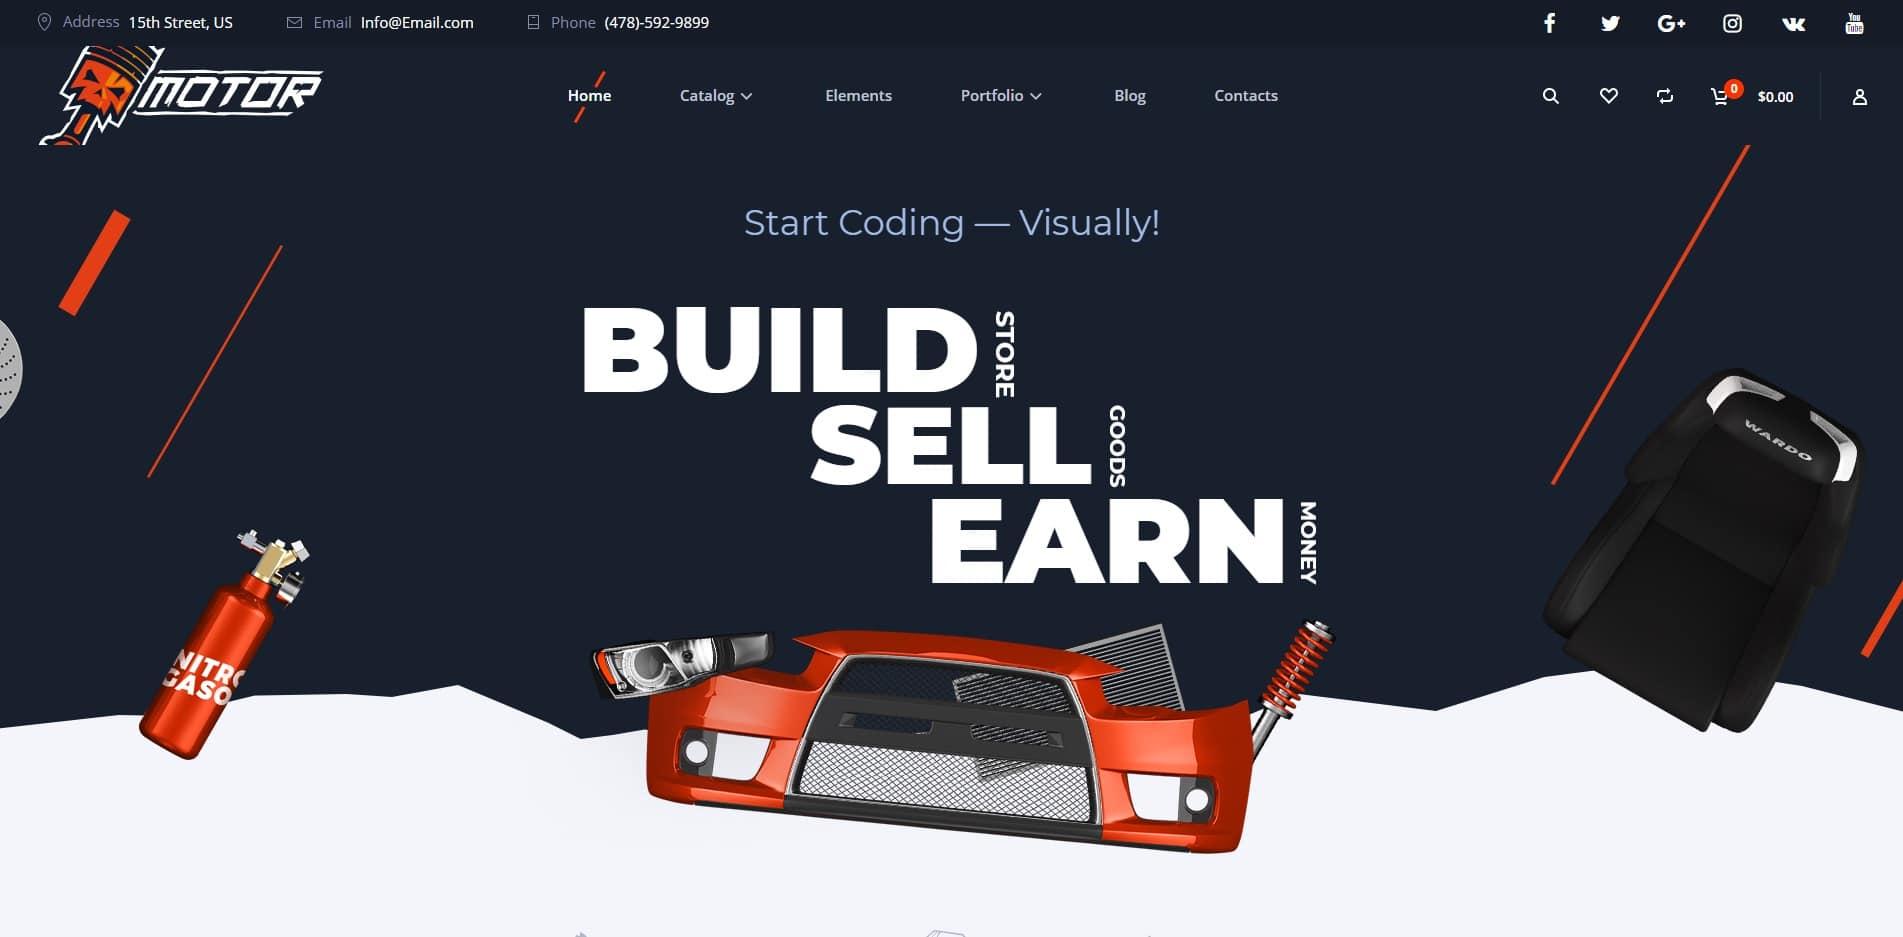 motor car dealer website template